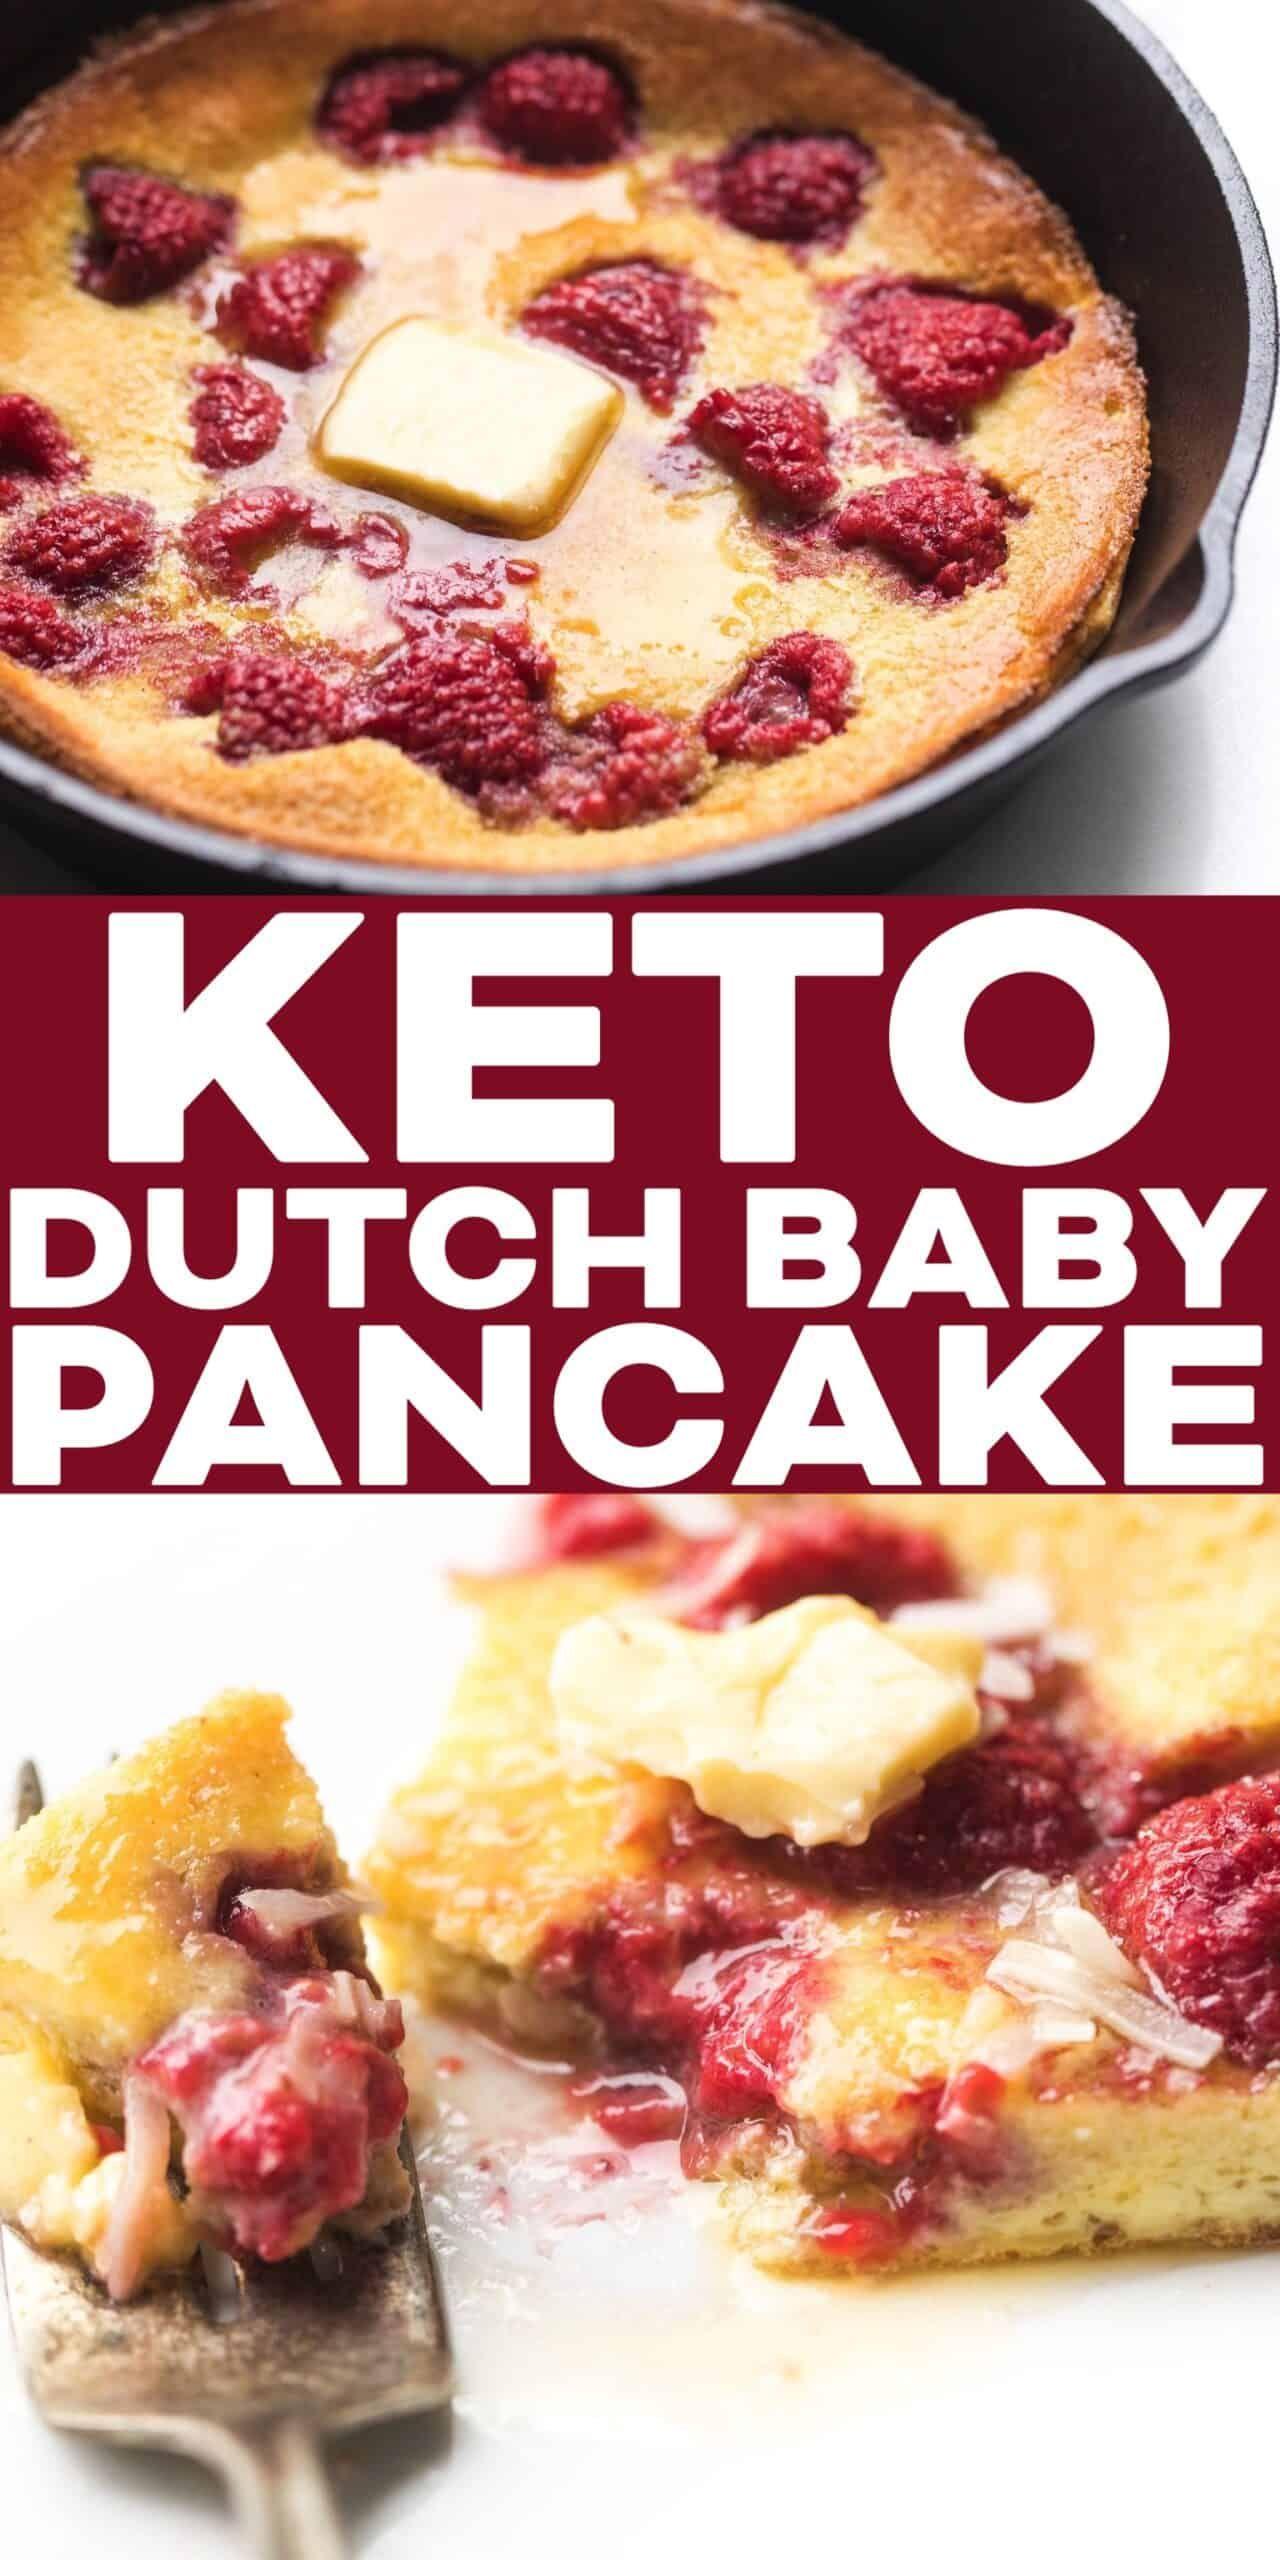 Keto Raspberry Dutch Baby Pancake